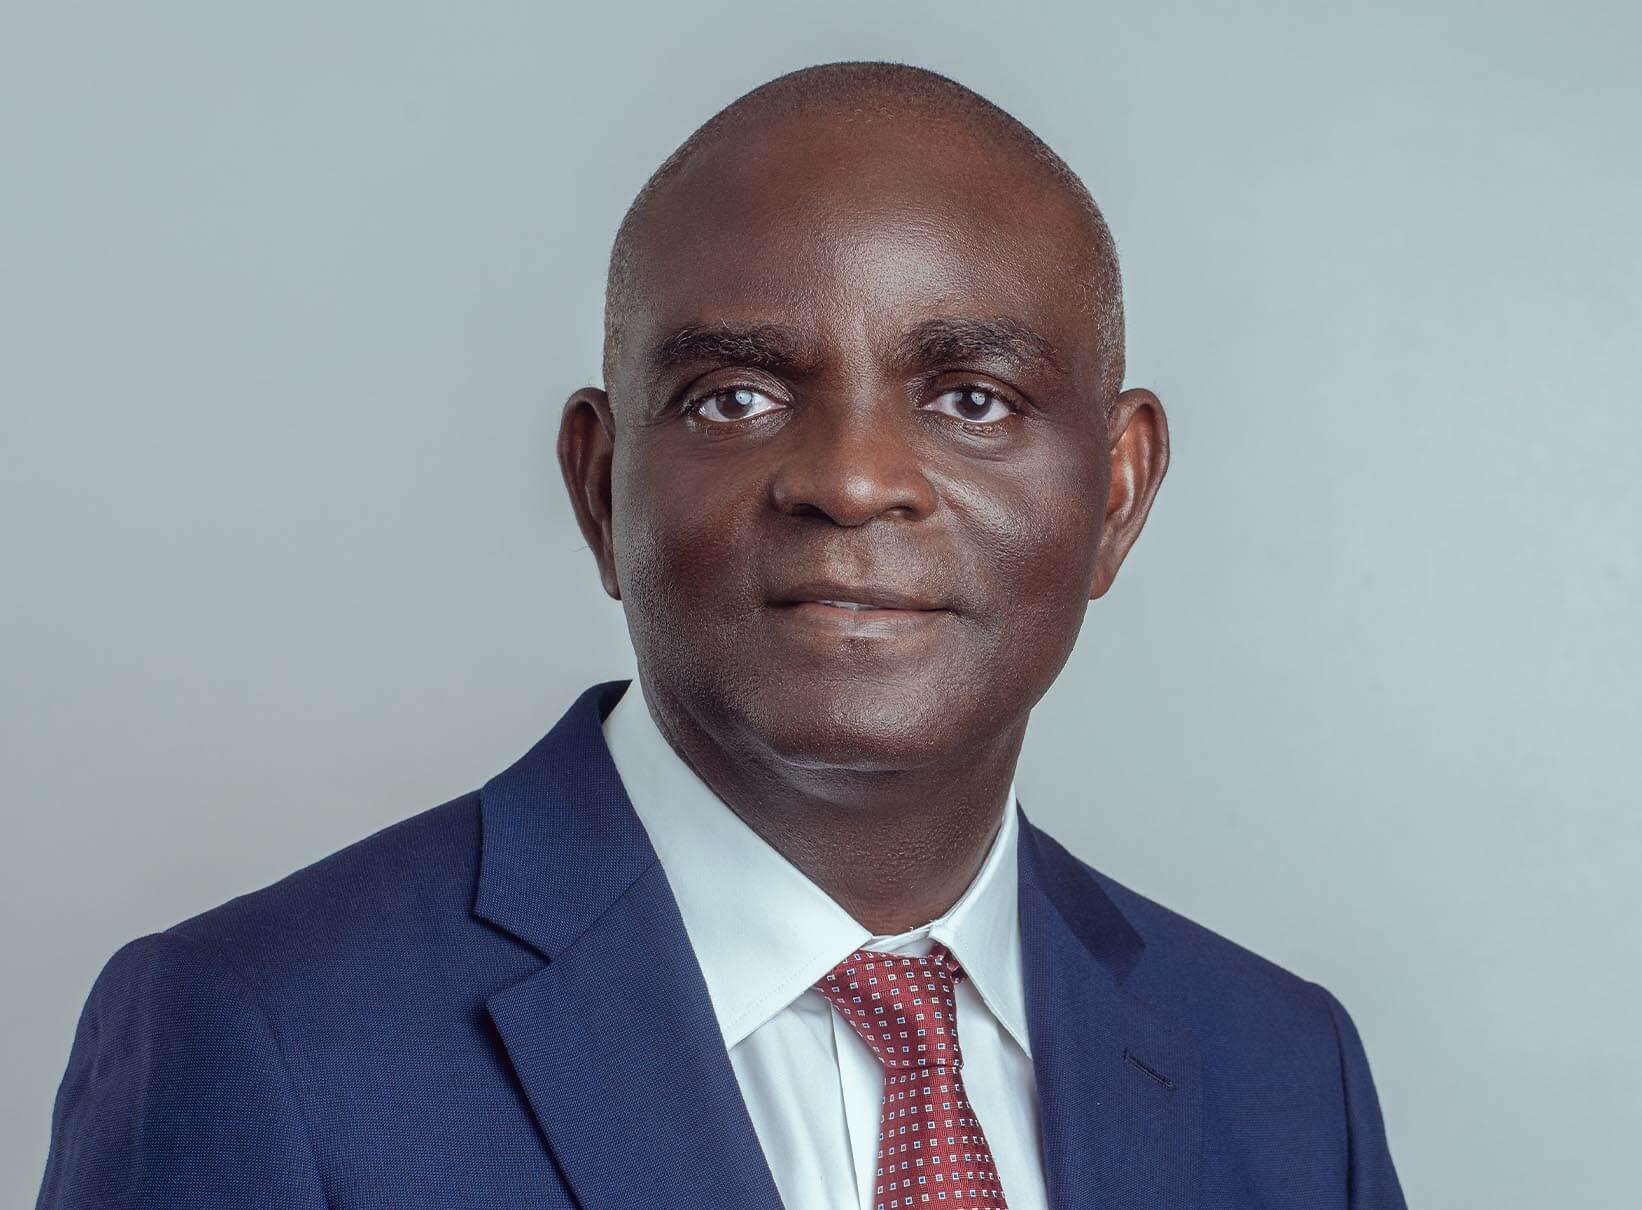 Mr. Dapo Oshinusi